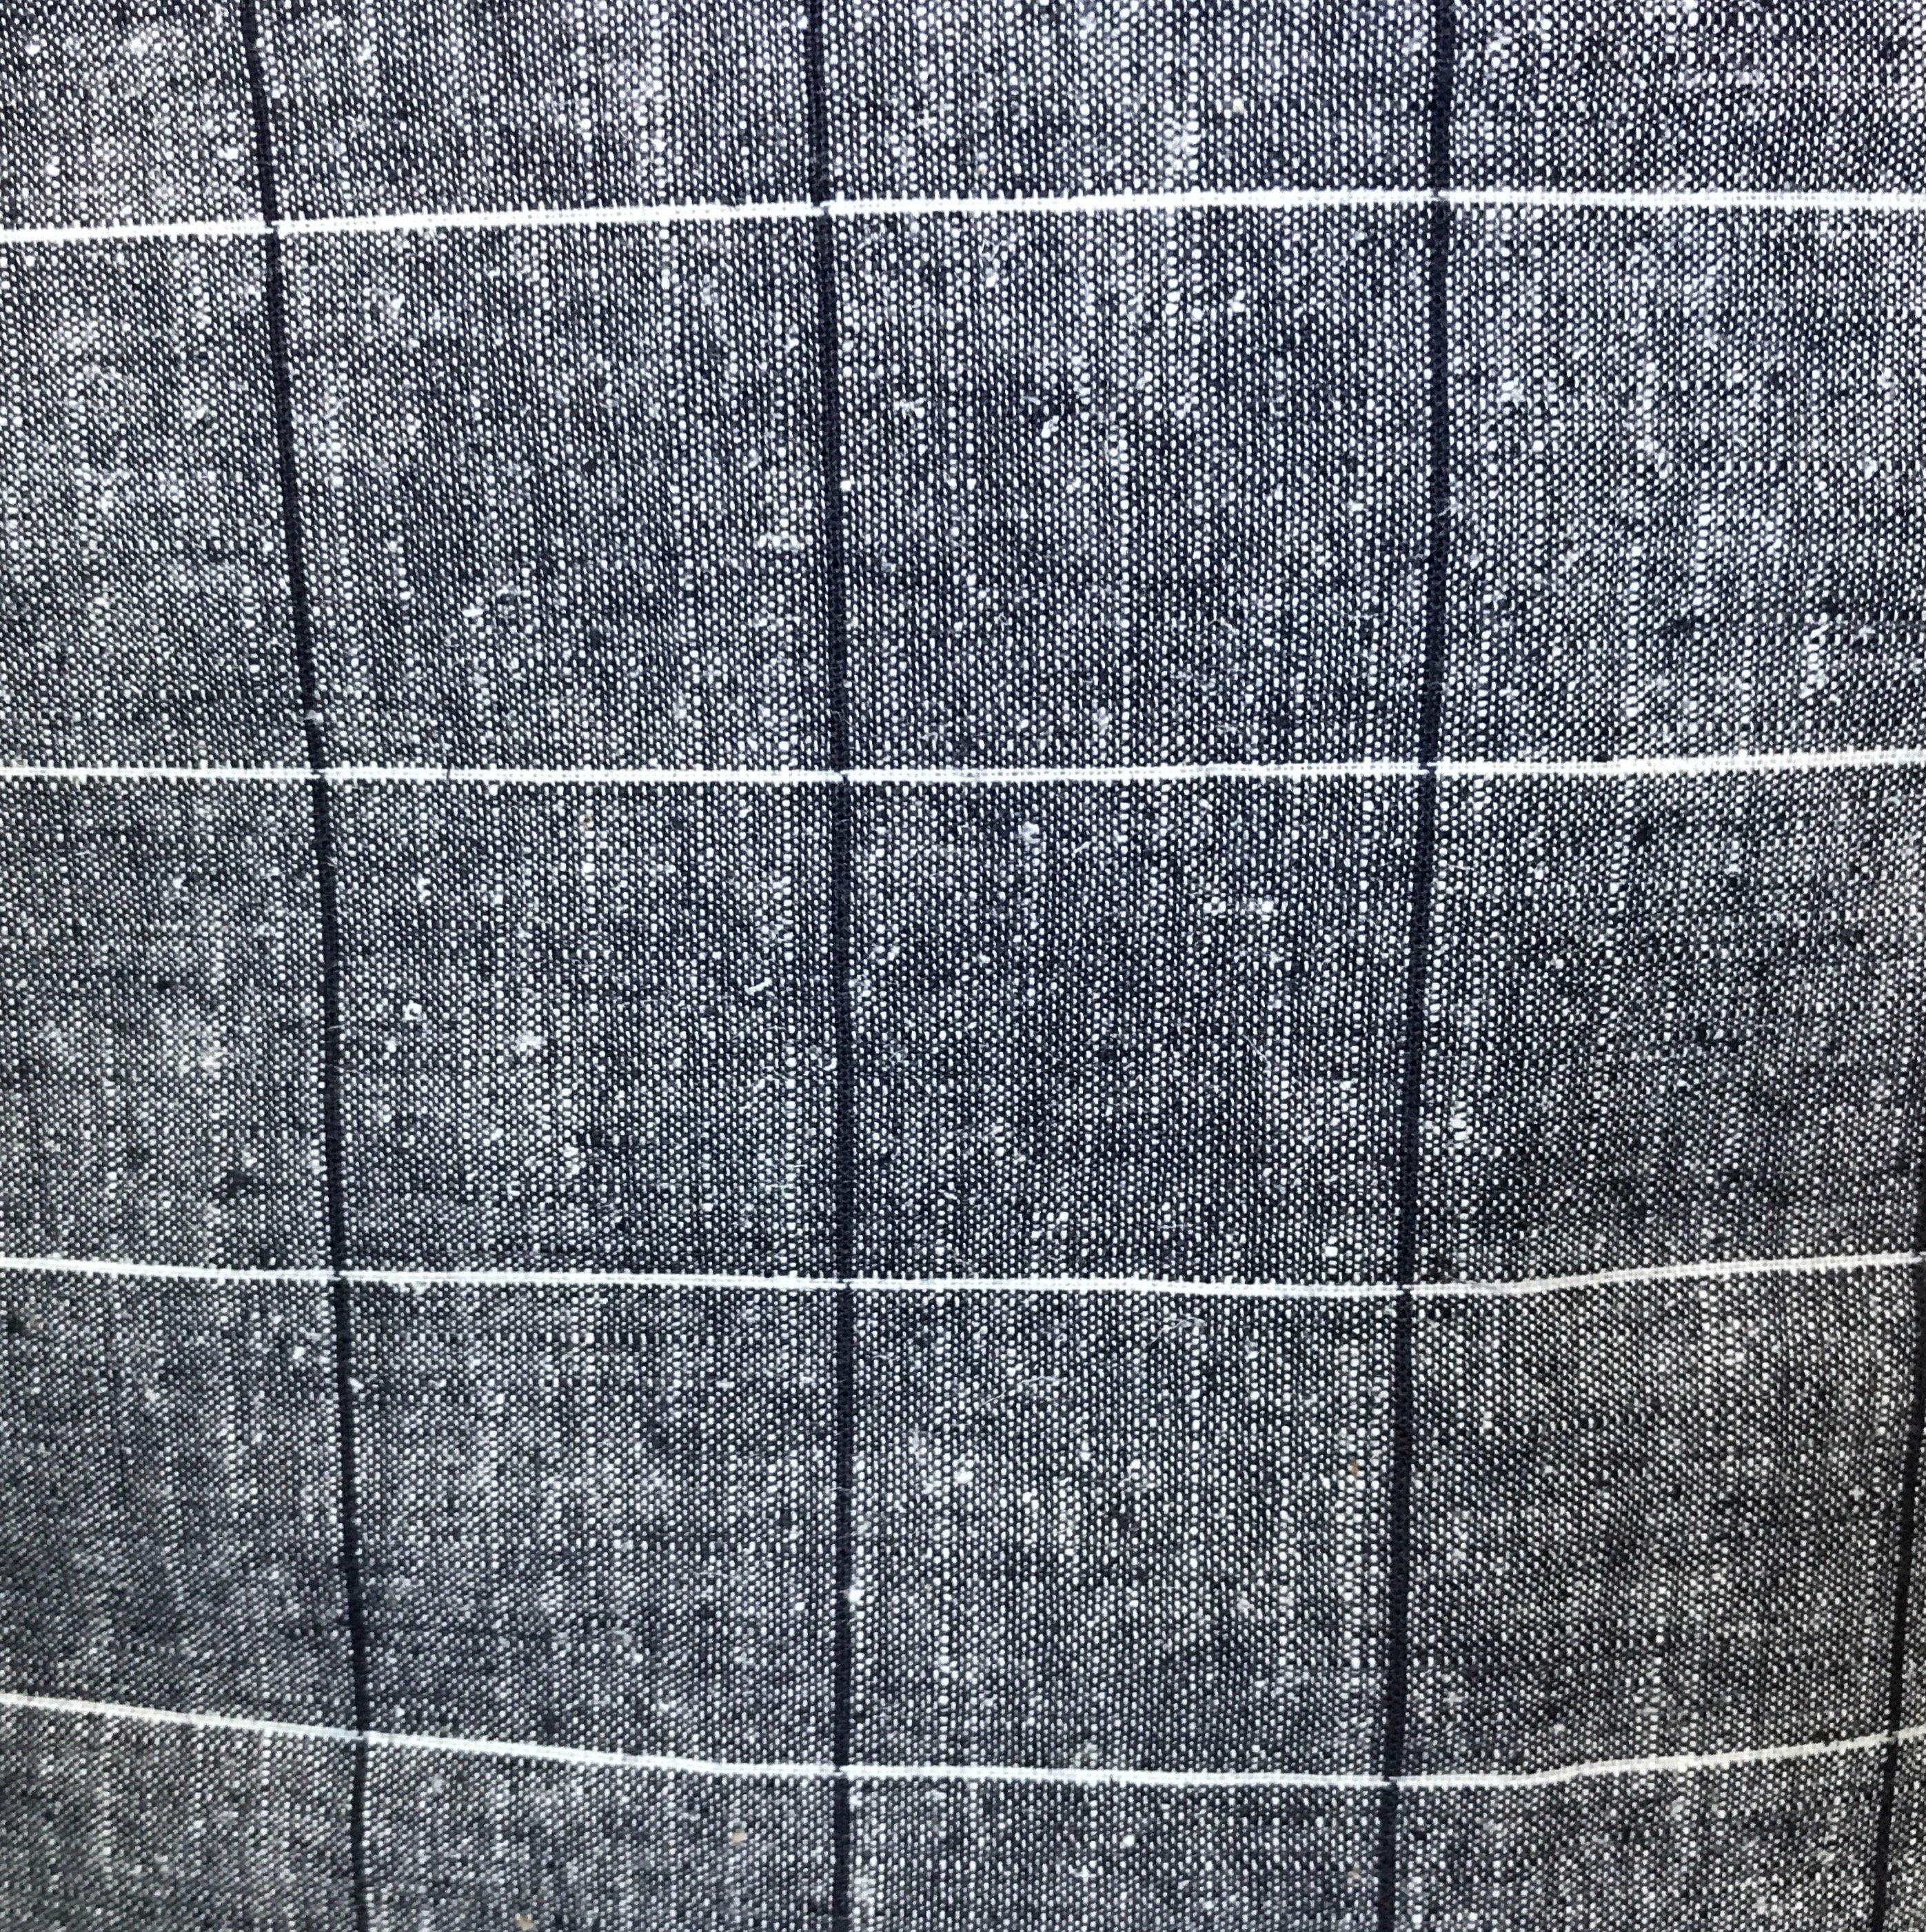 Yarn Dyed Plaid Hemp/Organic Cotton Blend, HECT01, Check